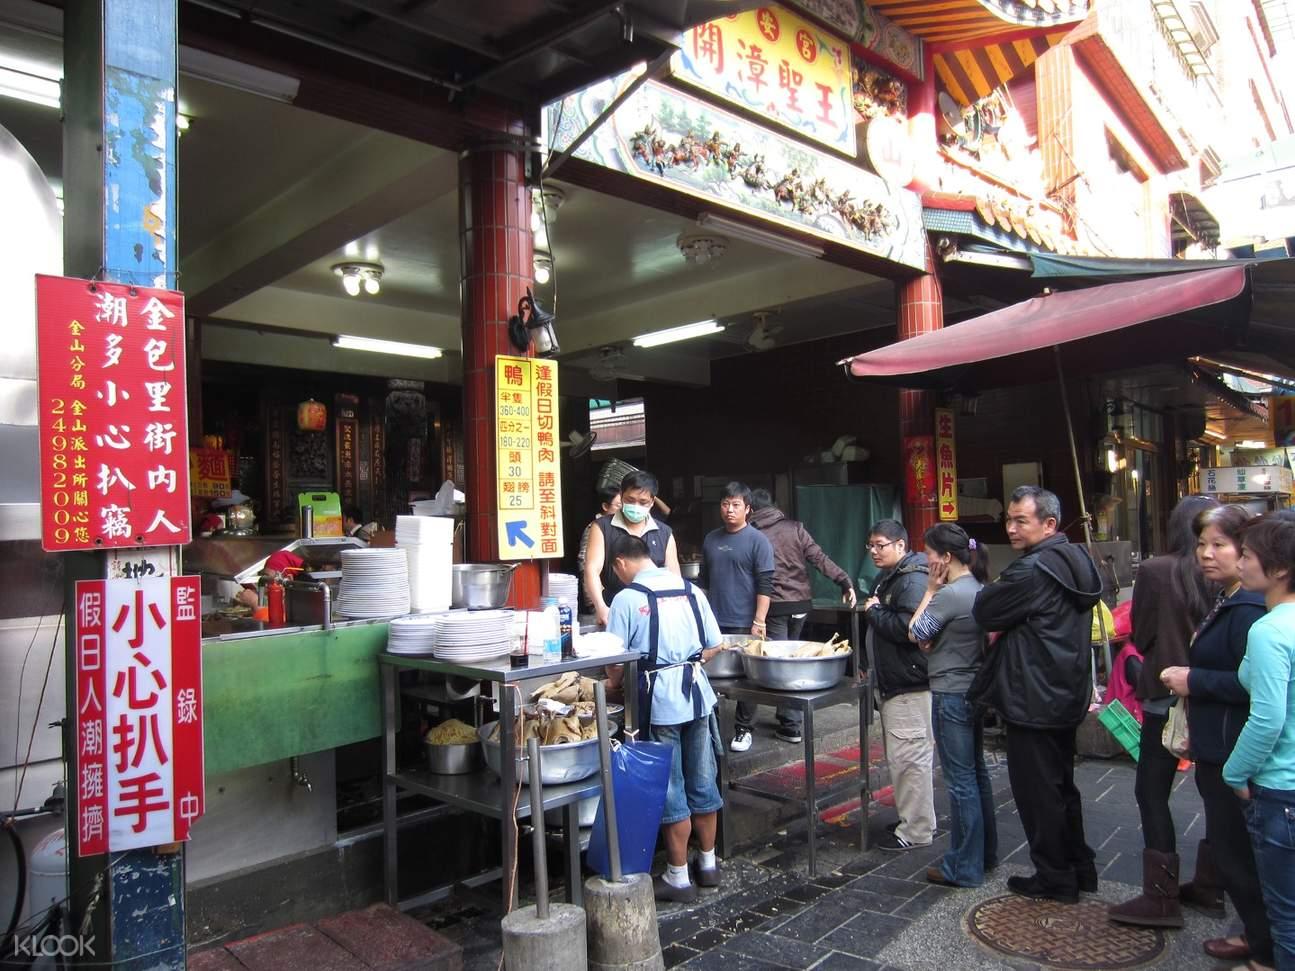 Jinshan Duck Meat Restaurant